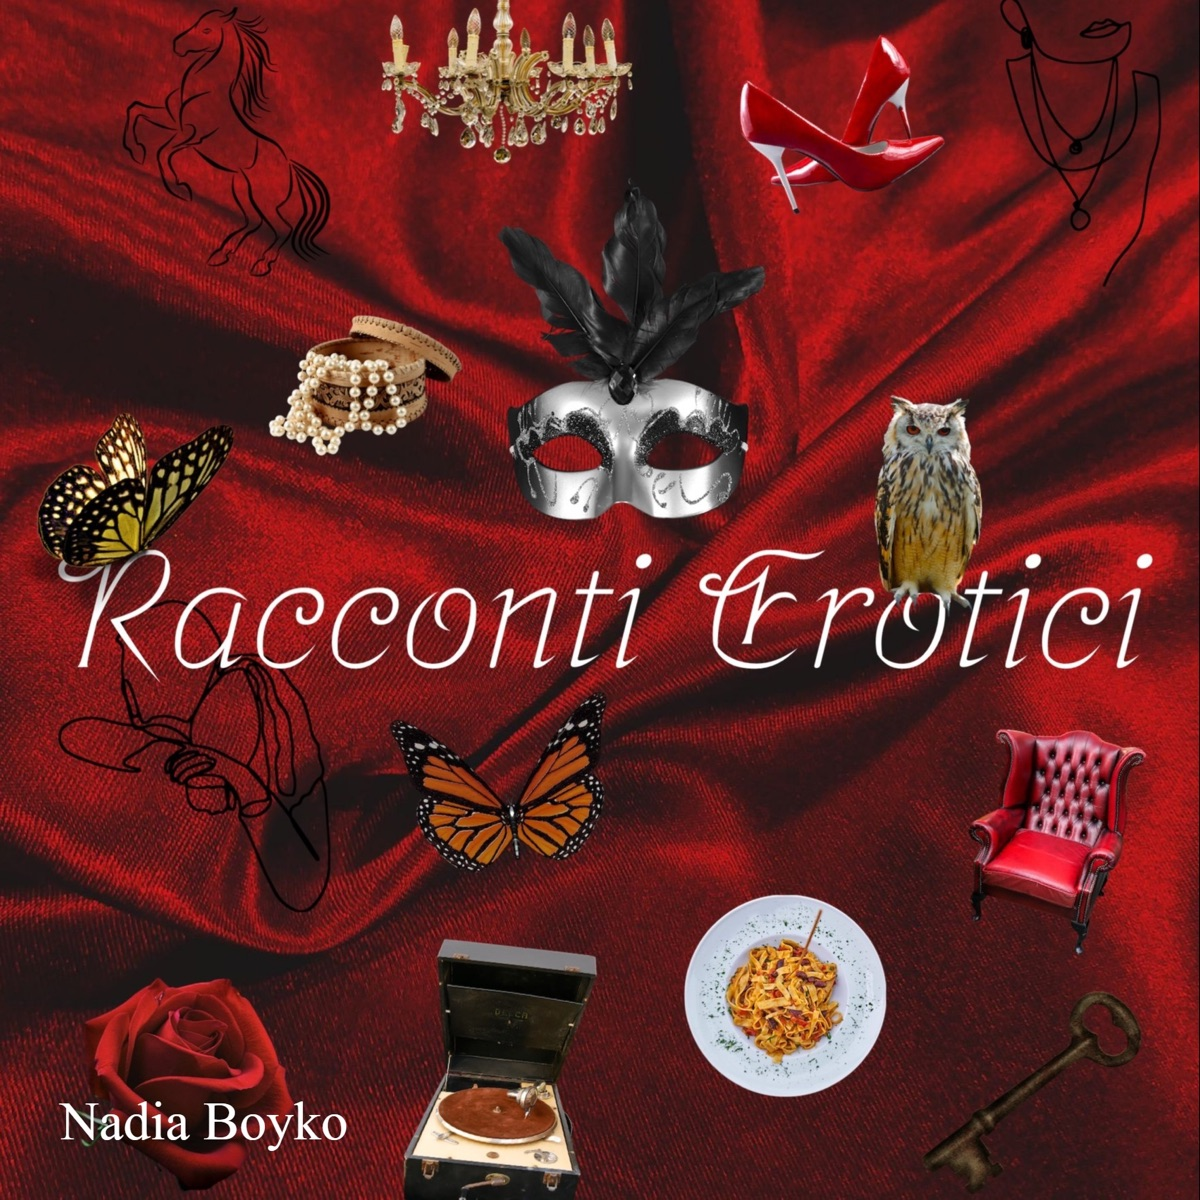 Racconti erotici, scritti e narrati da Nadia Boyko/ Erotic short stories in Italian, written and narrated by Nadia Boyko